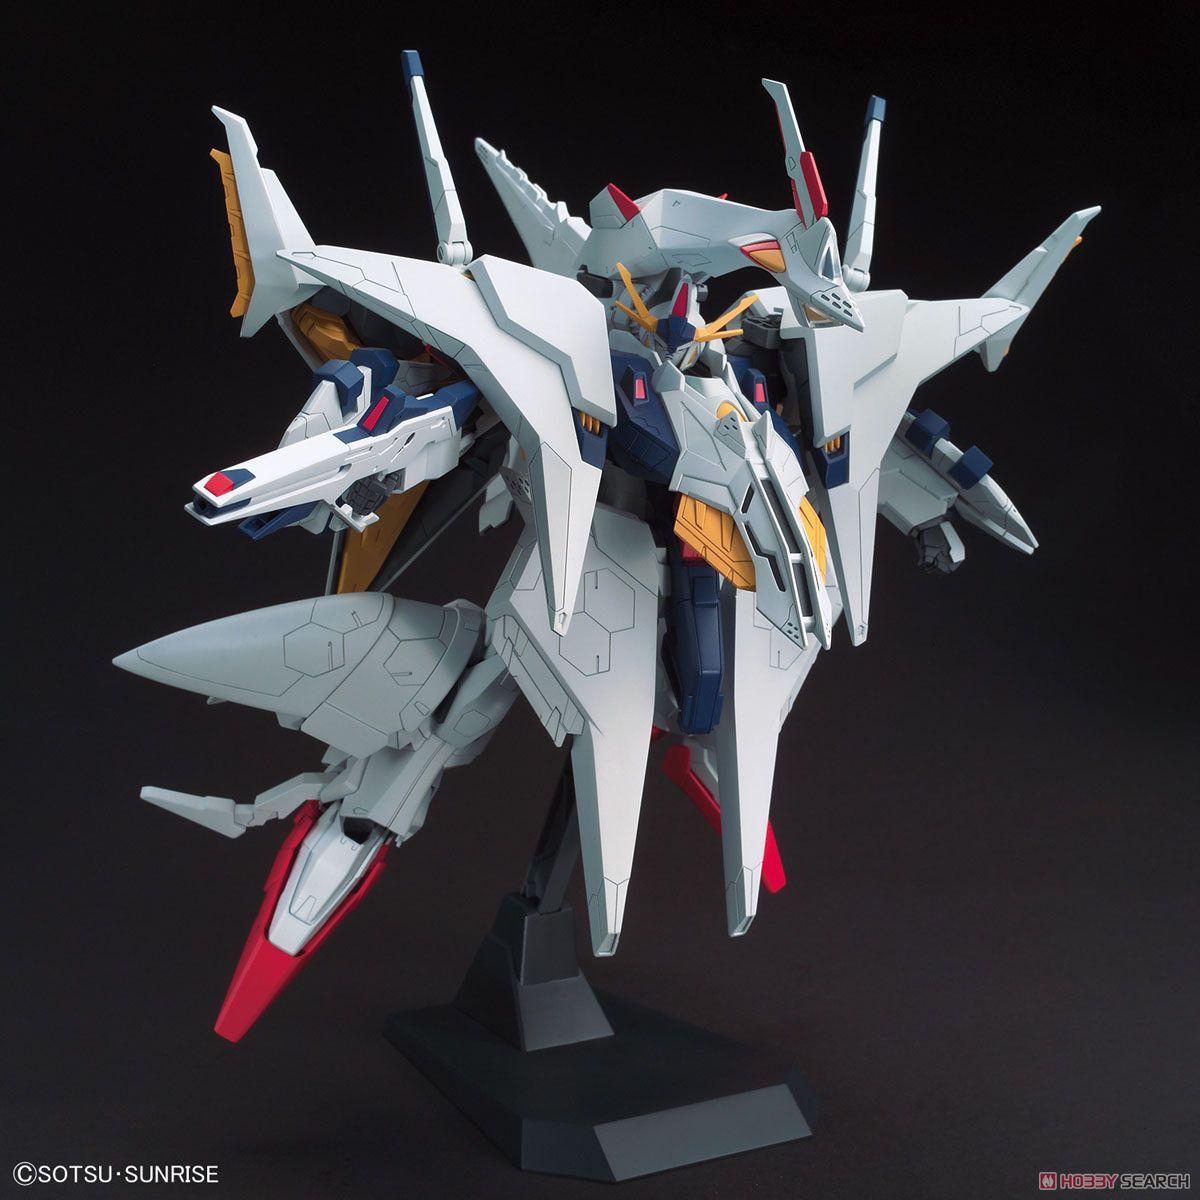 HGUC 1/144『ペーネロペー』機動戦士ガンダム 閃光のハサウェイ プラモデル-003